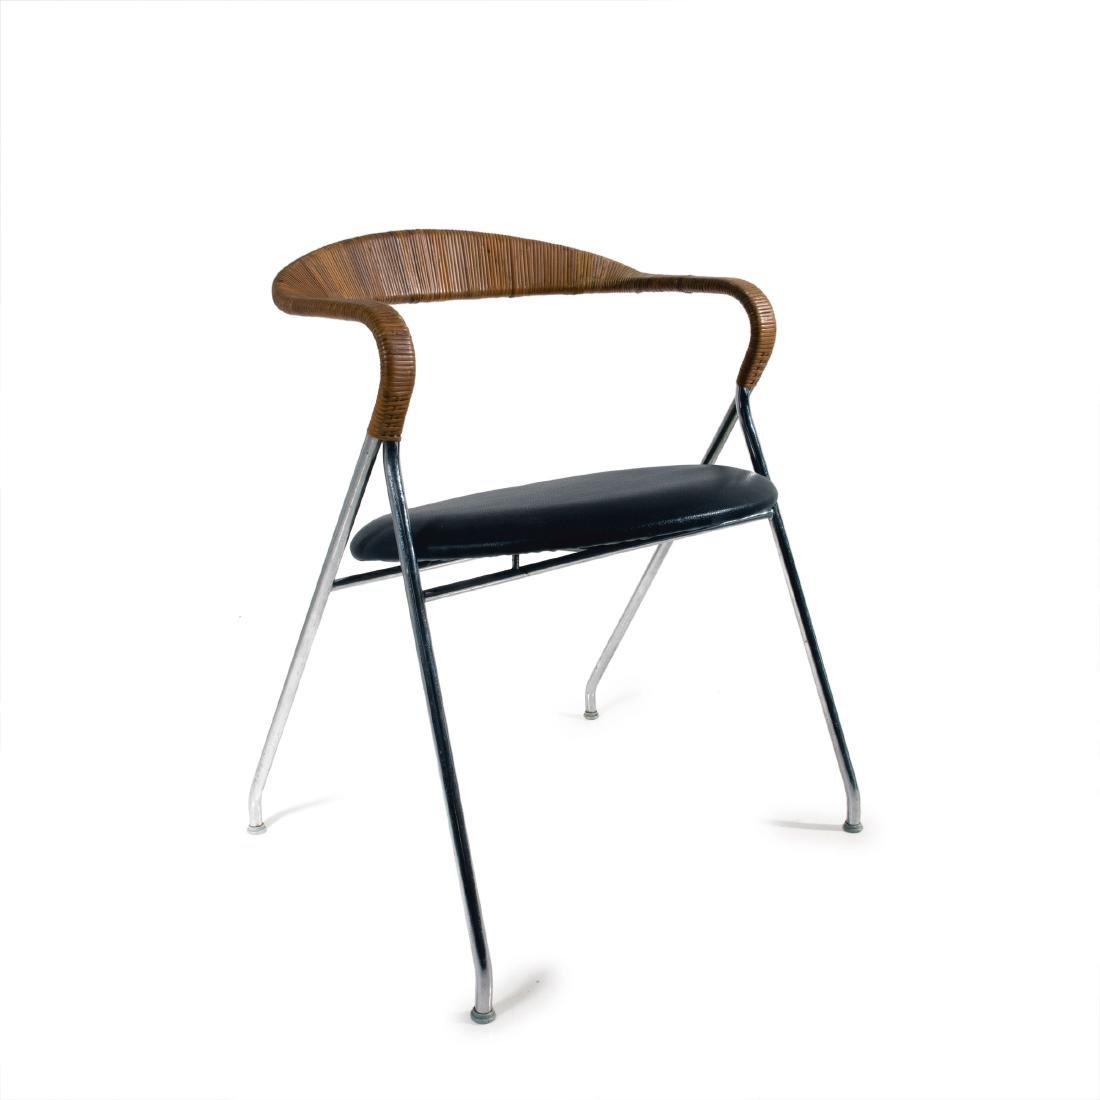 'Saffa' chair 'HE-103', 1955